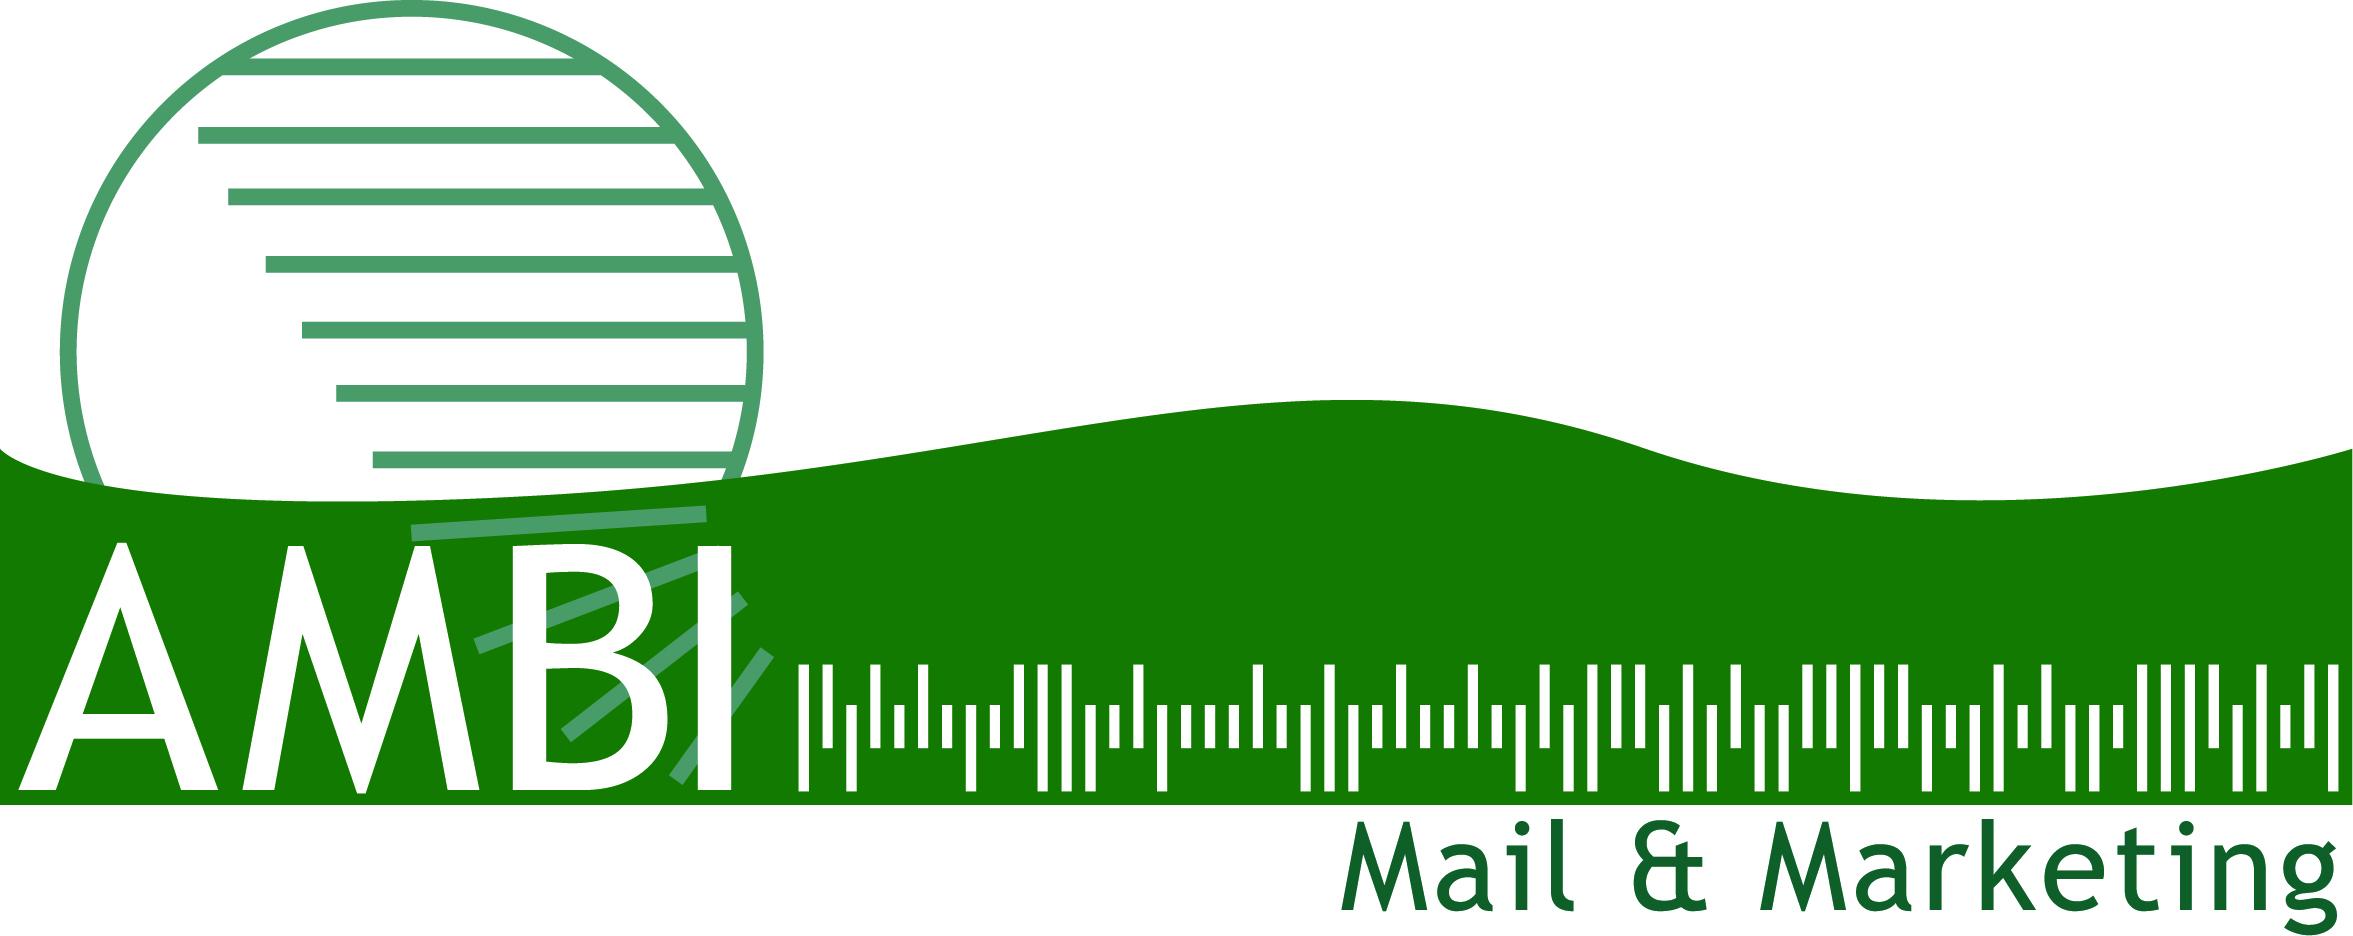 AMBI_Logo